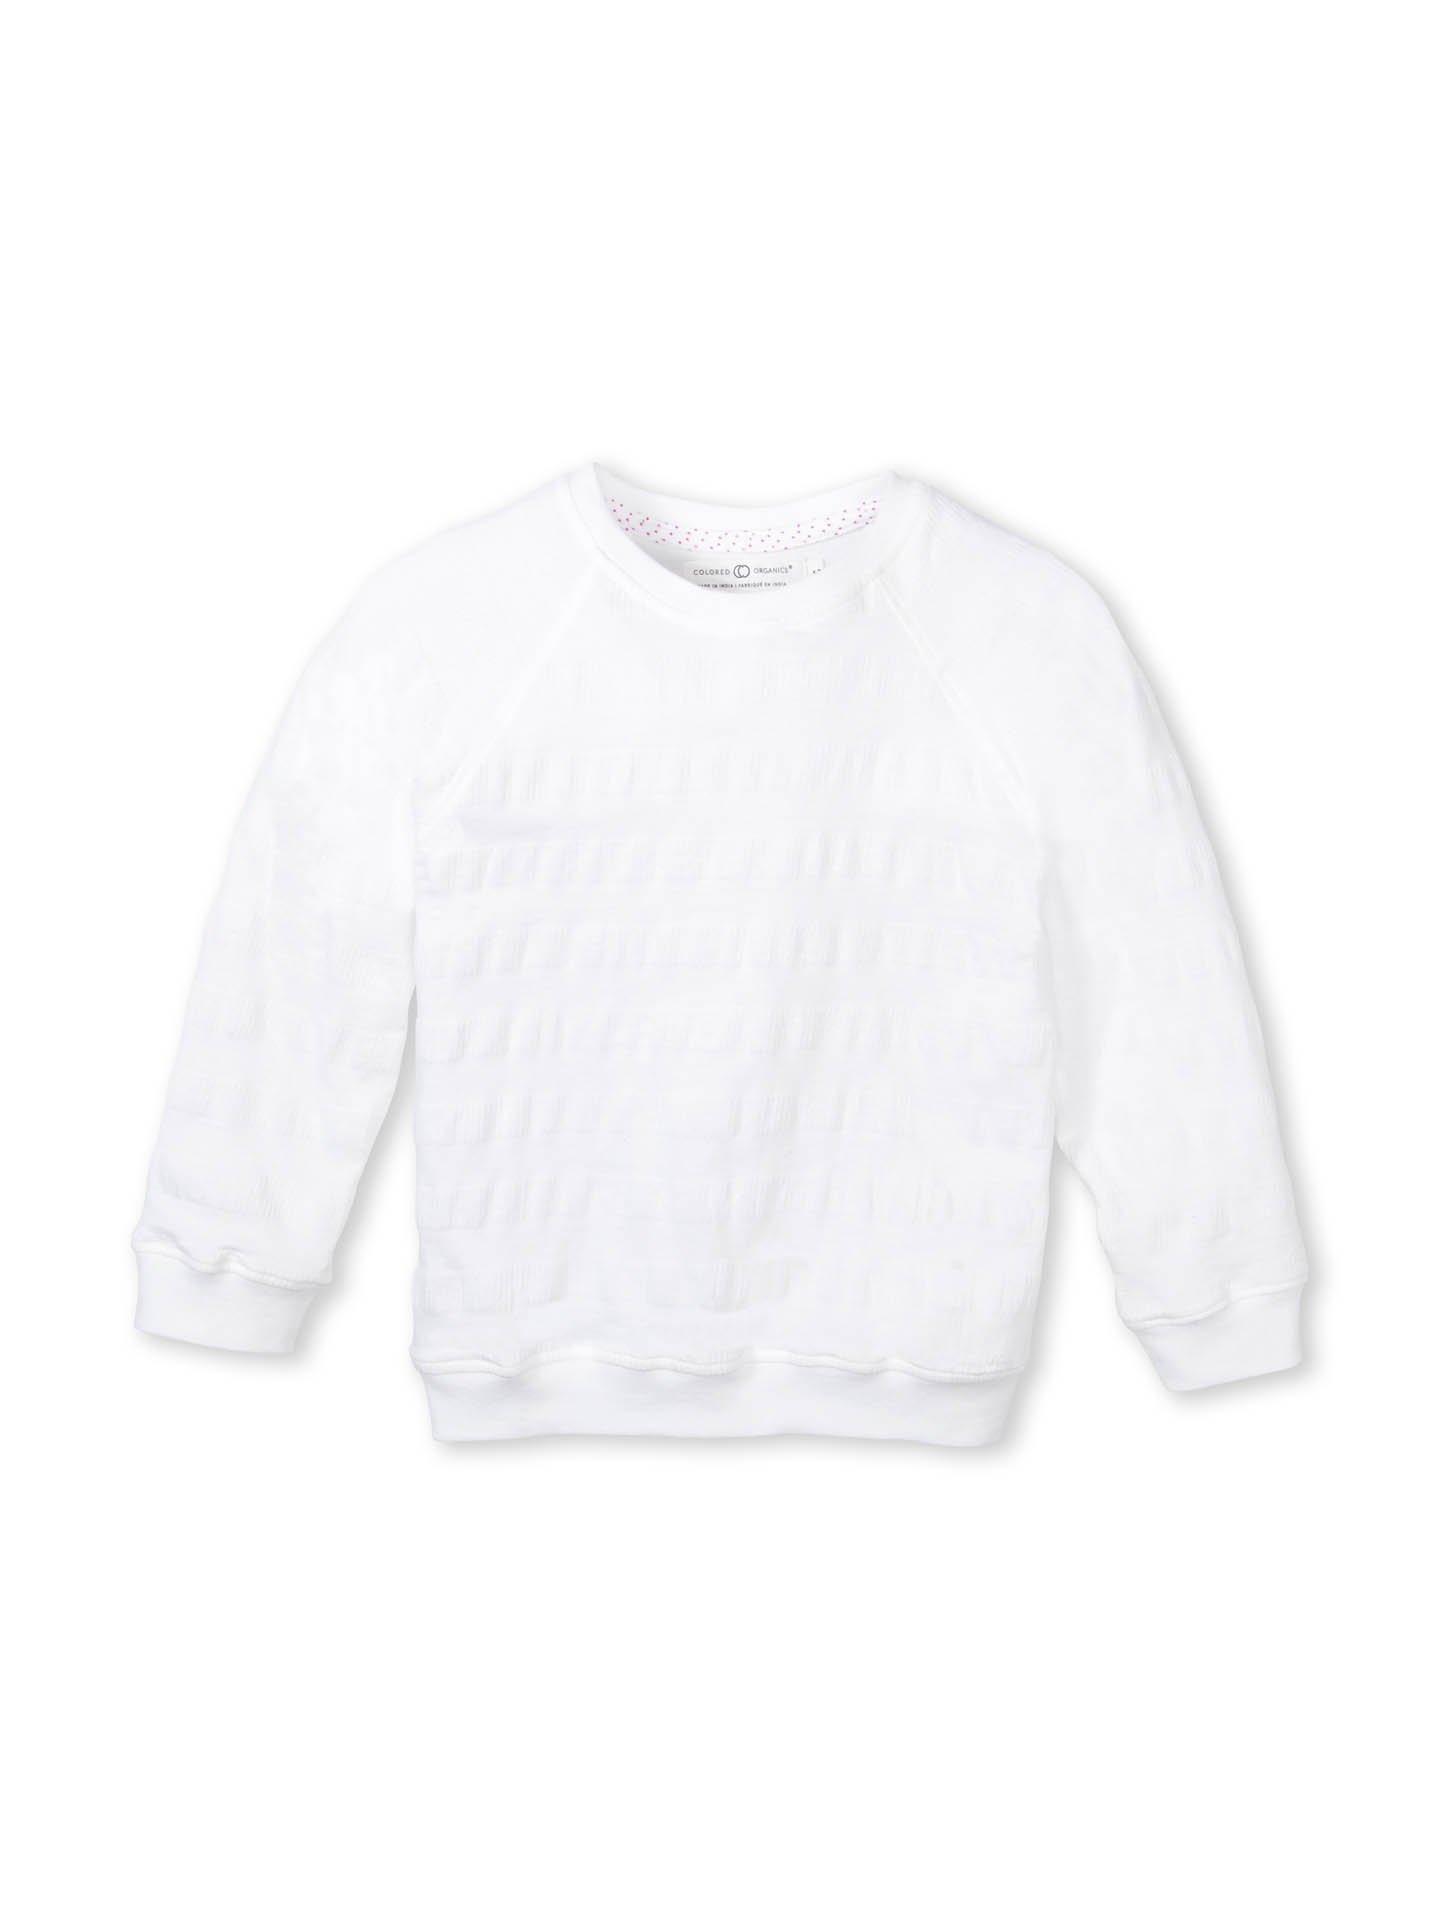 Colored Organics Girls' Organic Cotton Pullover Top - White - 4T